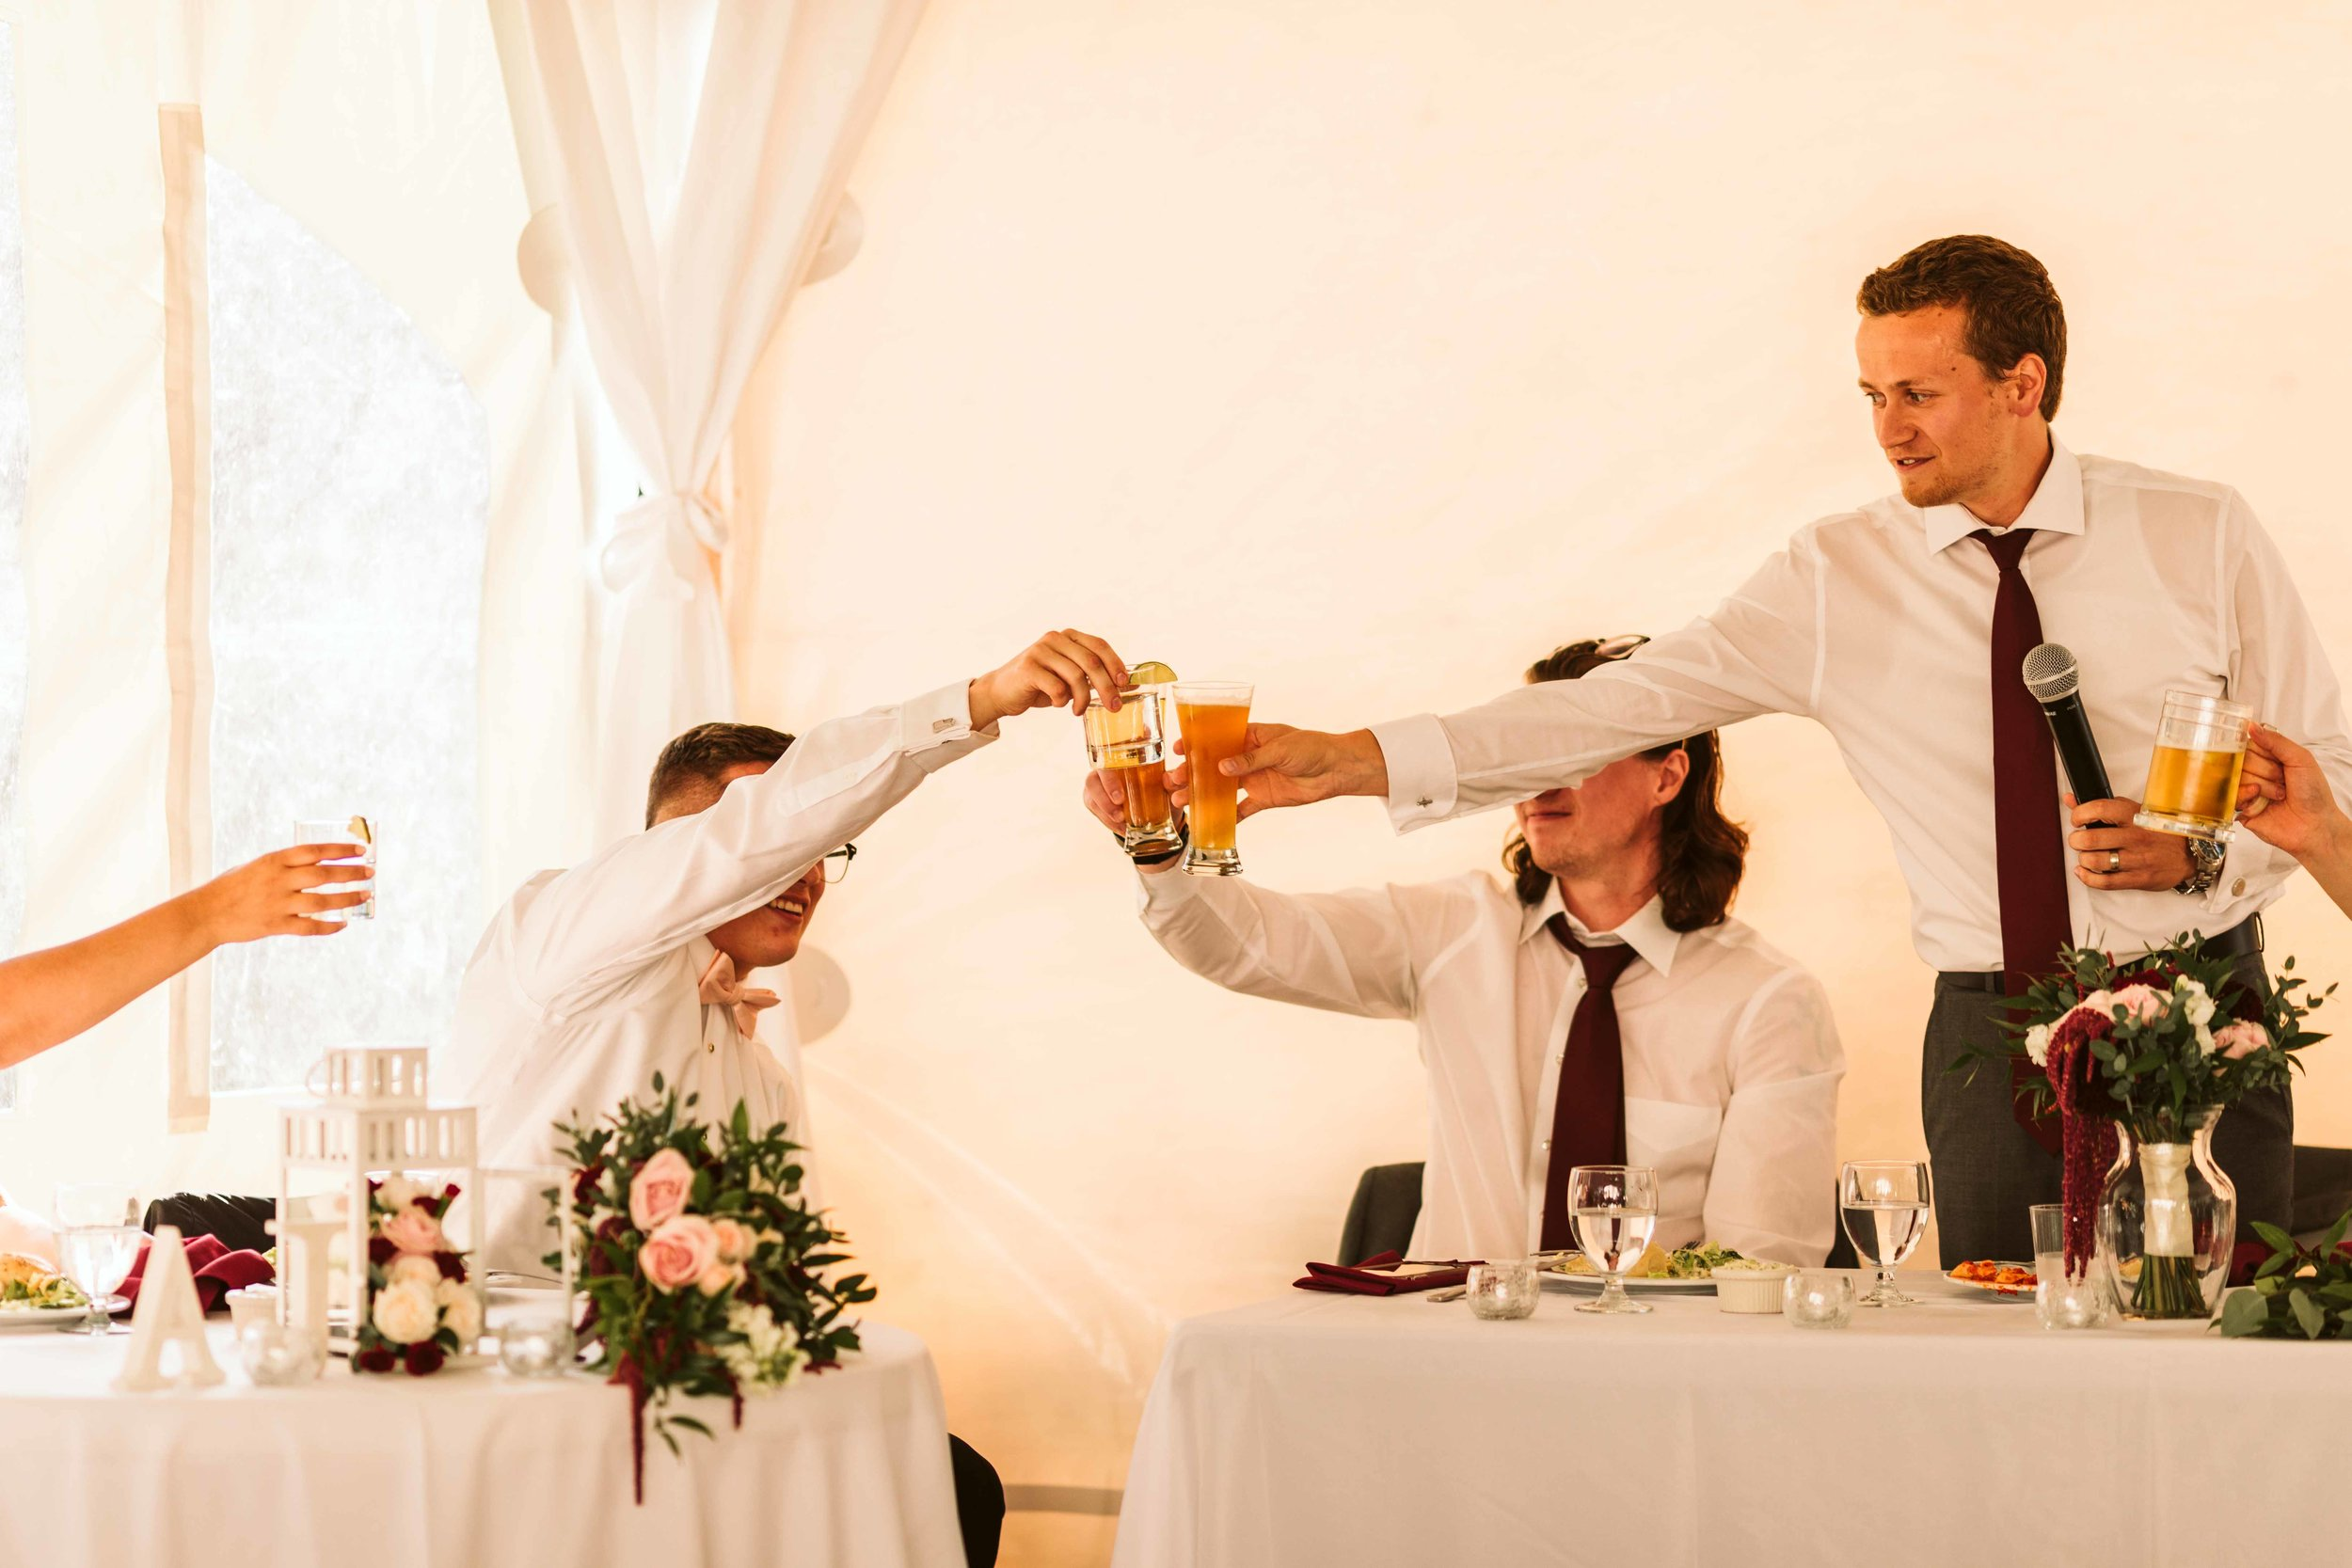 lairmont-manor-wedding-86.jpg